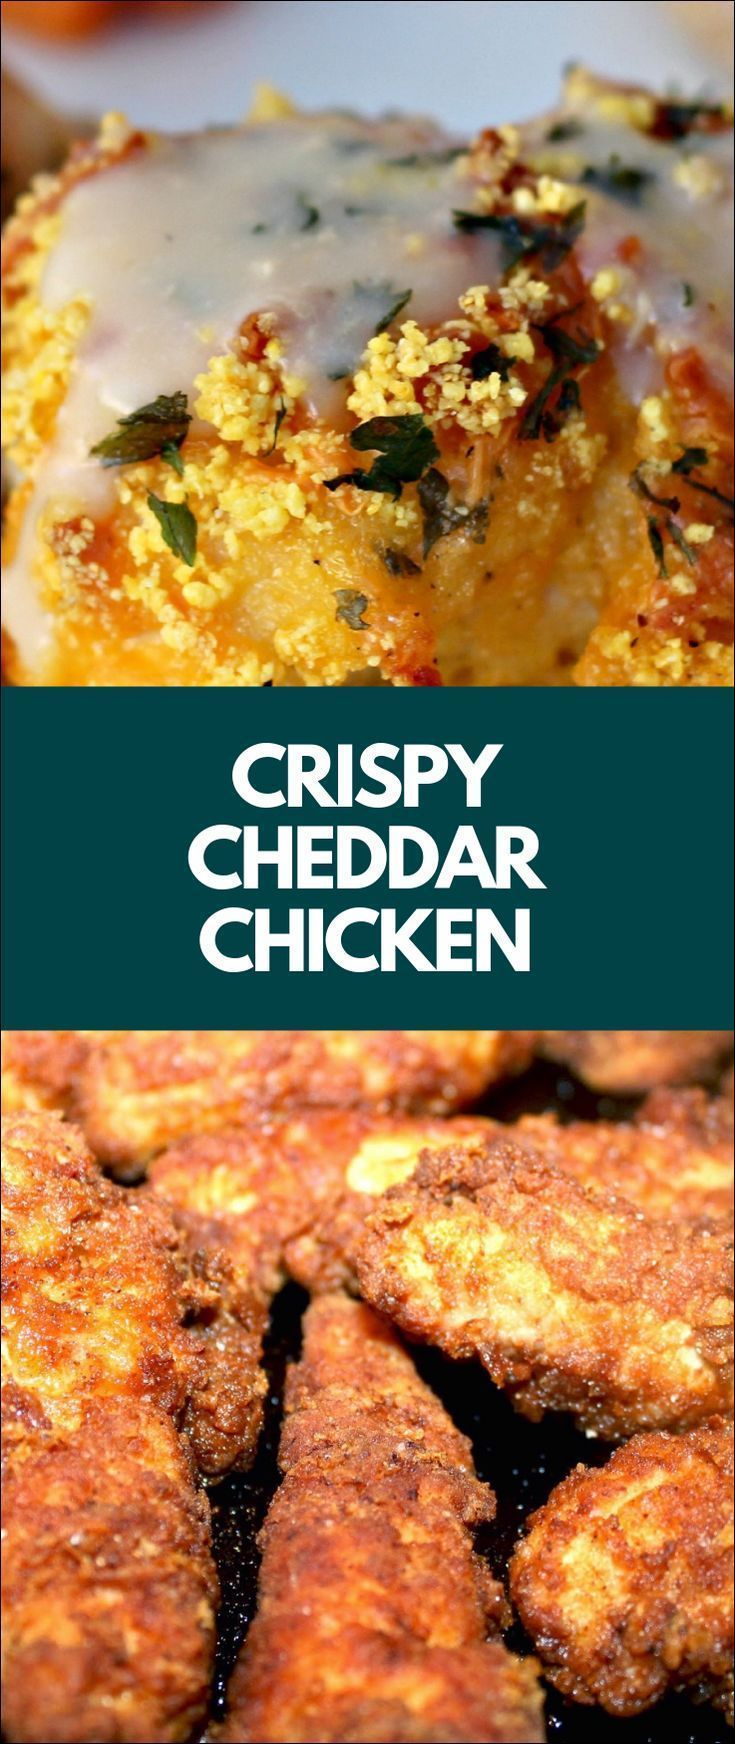 Crispy Cheddar Chicken #crispycheddarchicken Crispy Cheddar Chicken #crispycheddarchicken Crispy Cheddar Chicken #crispycheddarchicken Crispy Cheddar Chicken #crispycheddarchicken Crispy Cheddar Chicken #crispycheddarchicken Crispy Cheddar Chicken #crispycheddarchicken Crispy Cheddar Chicken #crispycheddarchicken Crispy Cheddar Chicken #crispycheddarchicken